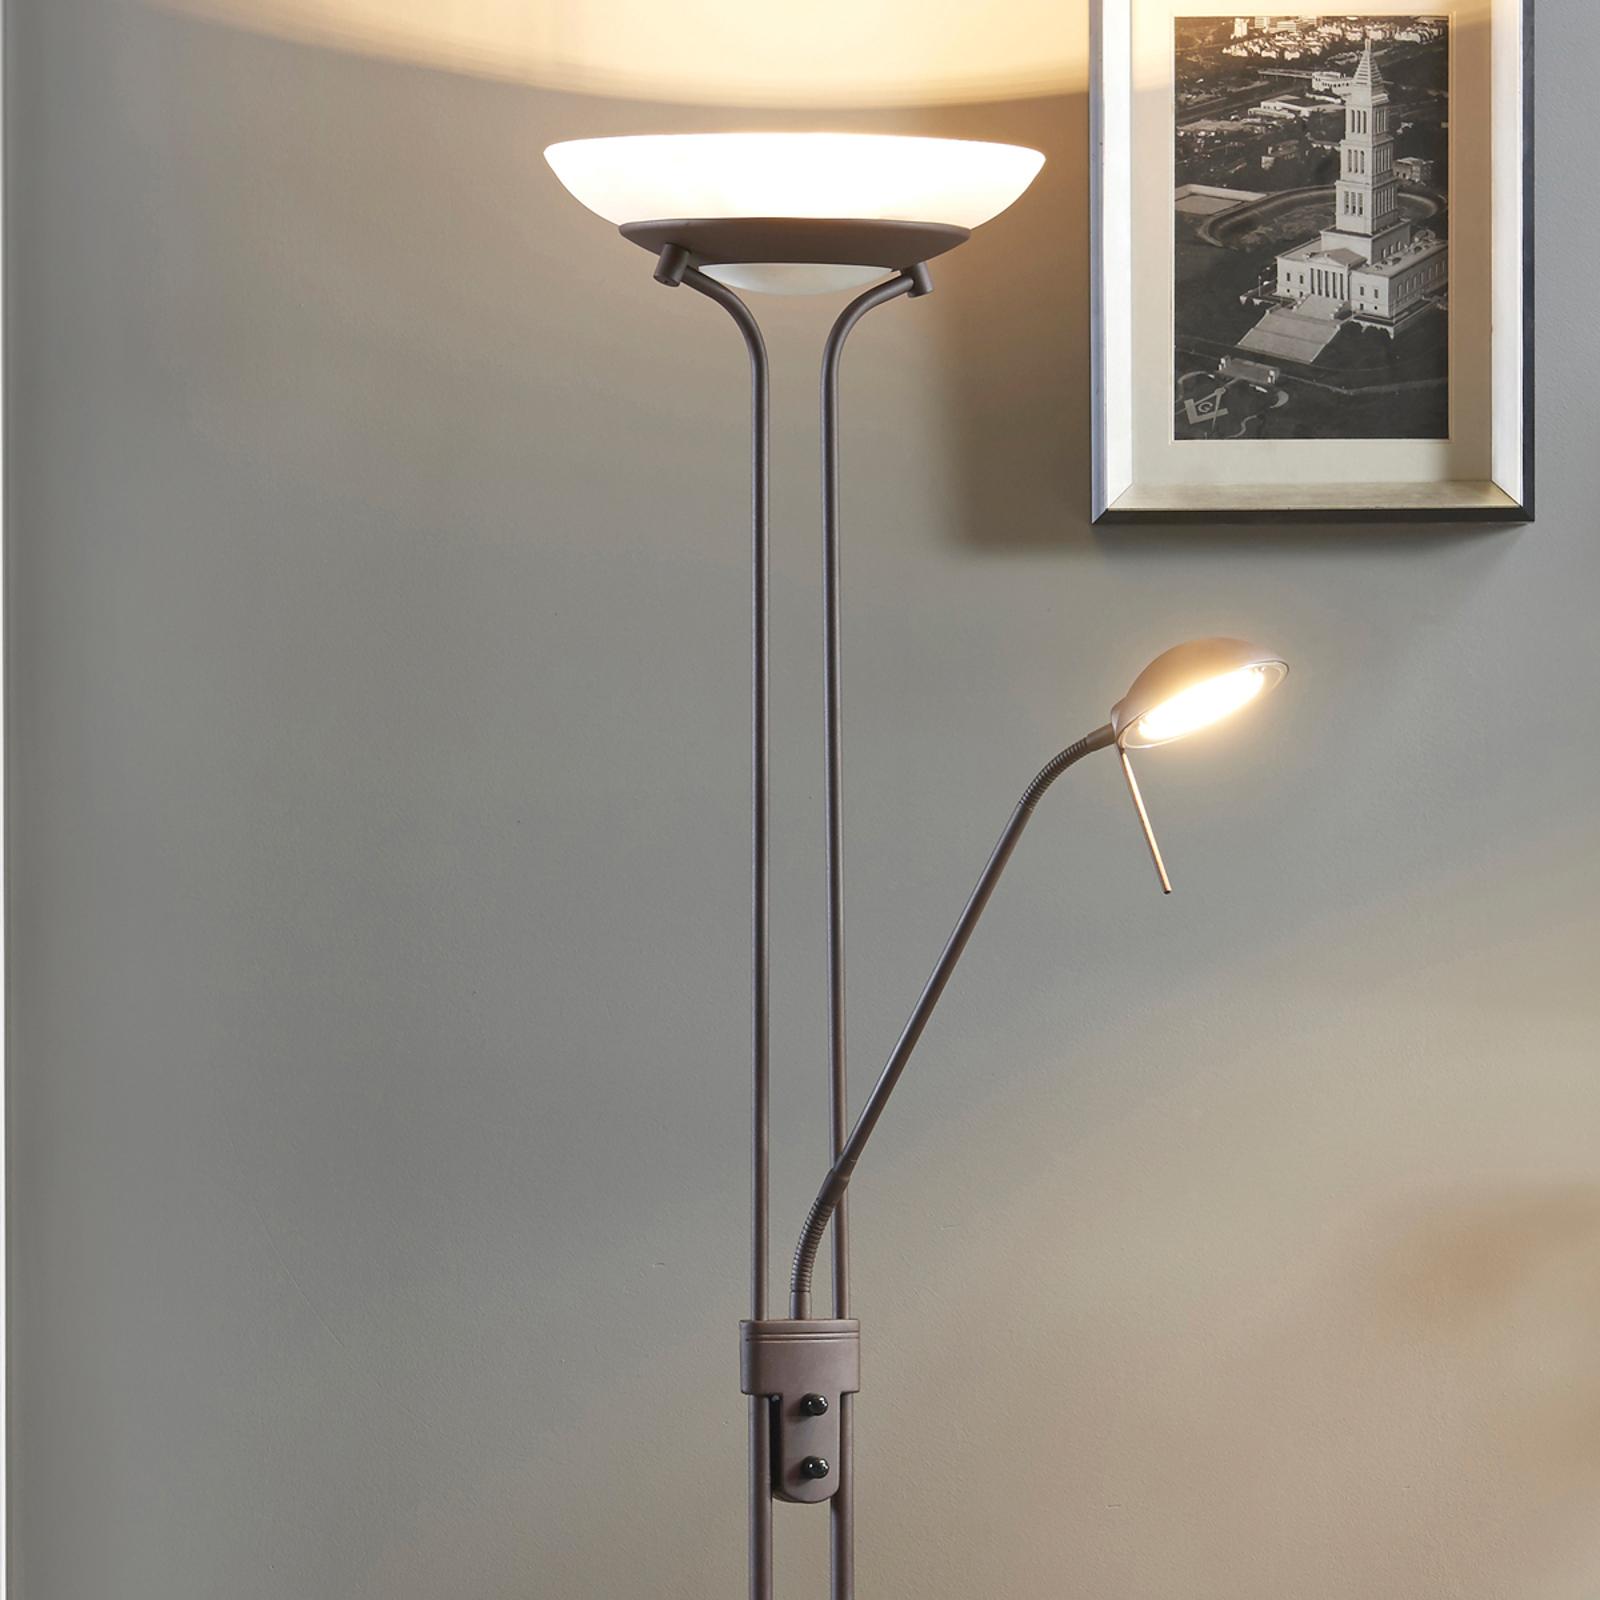 Acquista Yveta - lampada LED da terra dimmerabile ruggine